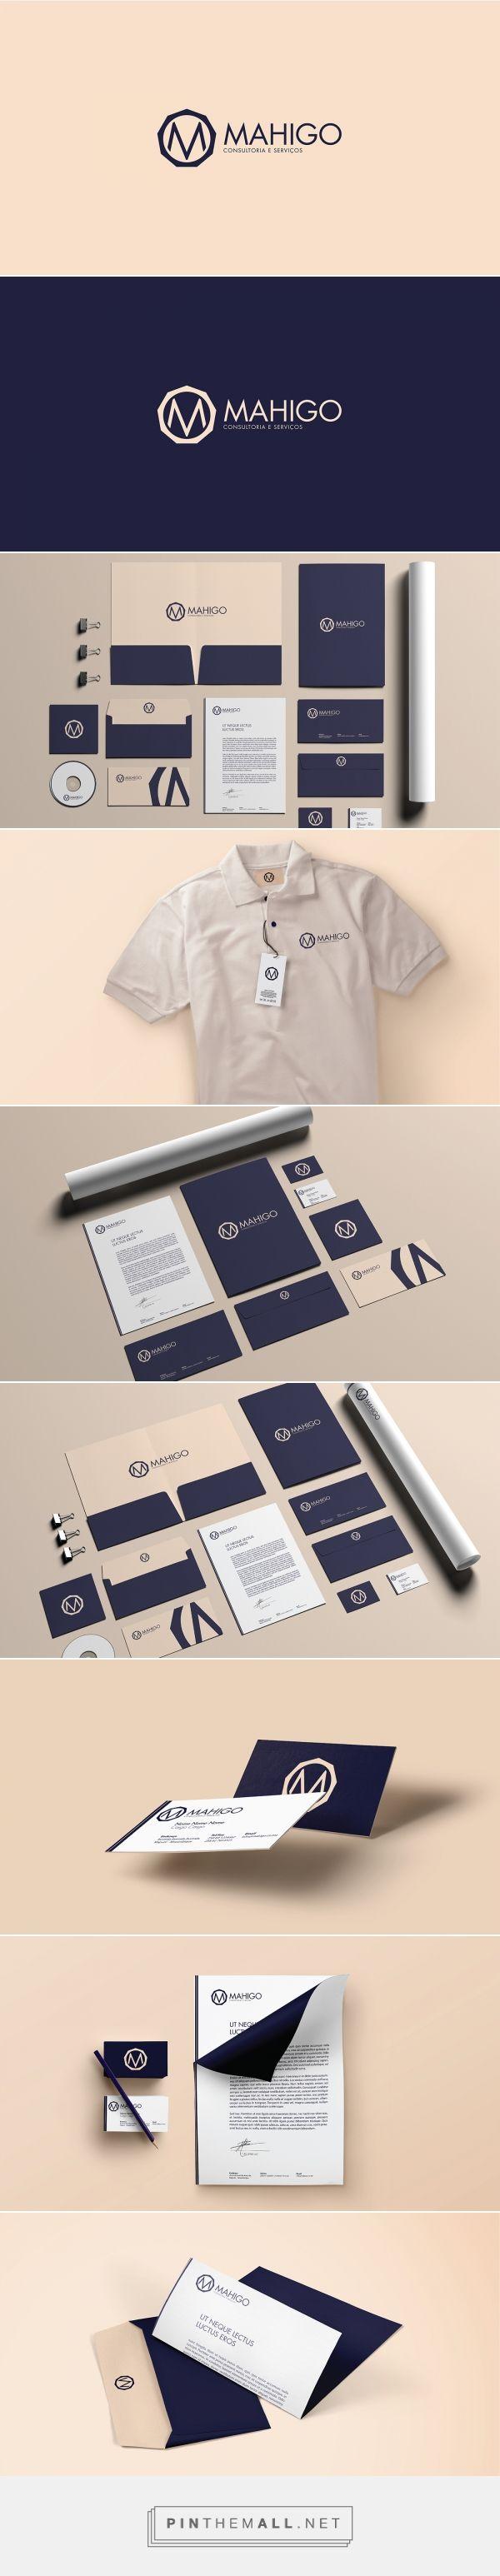 Mahigo Corporate Identity on Behance  | Fivestar Branding – Design and Branding Agency & Inspiration Gallery